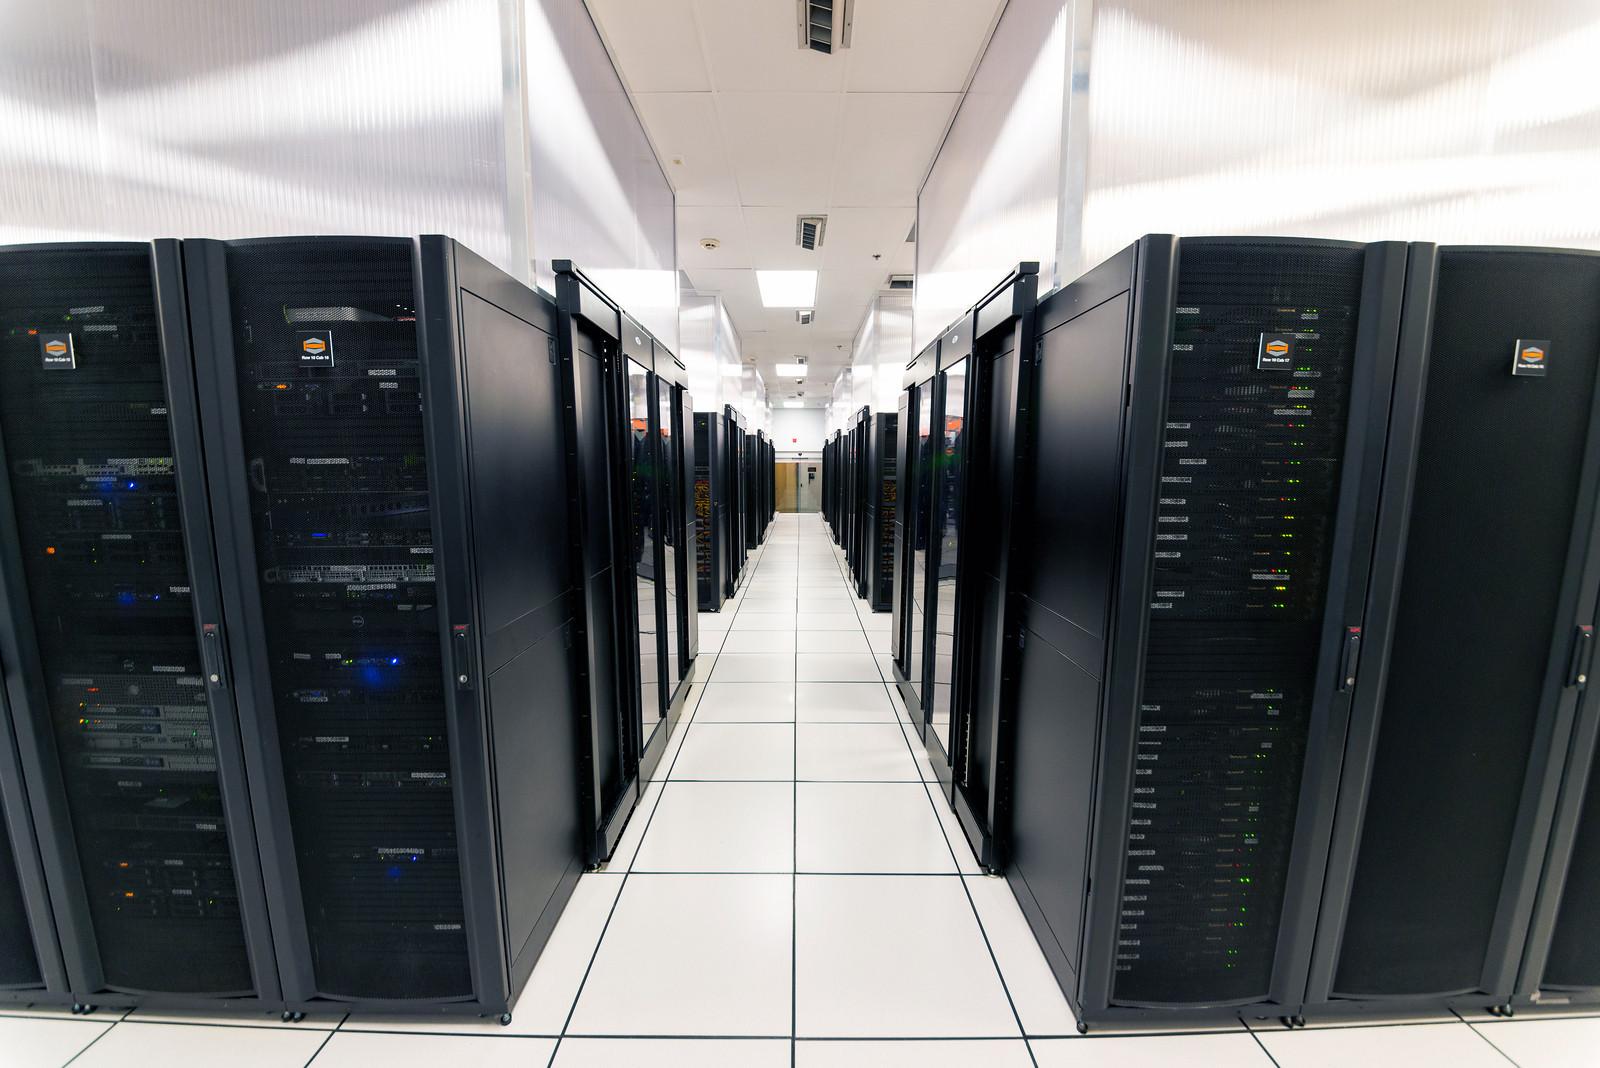 hostdime datacenter floor